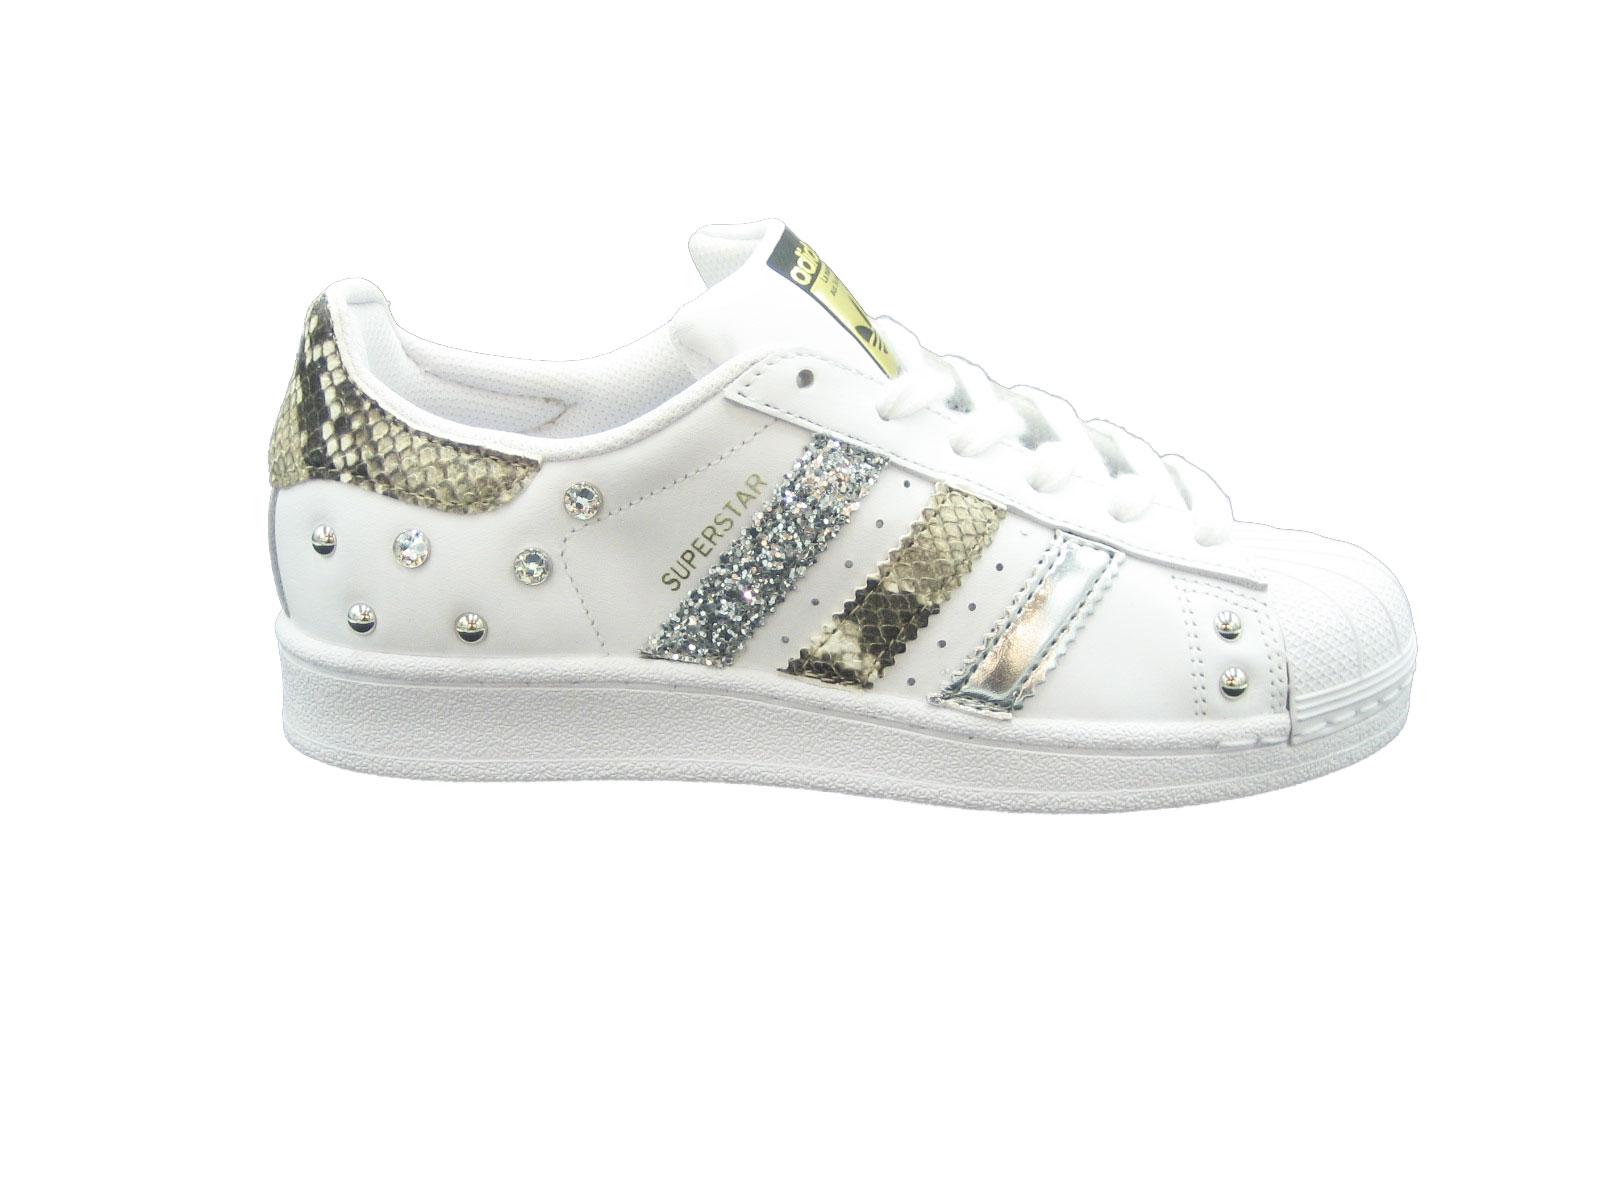 E19 Adidas Superstar46 Silver.jpg